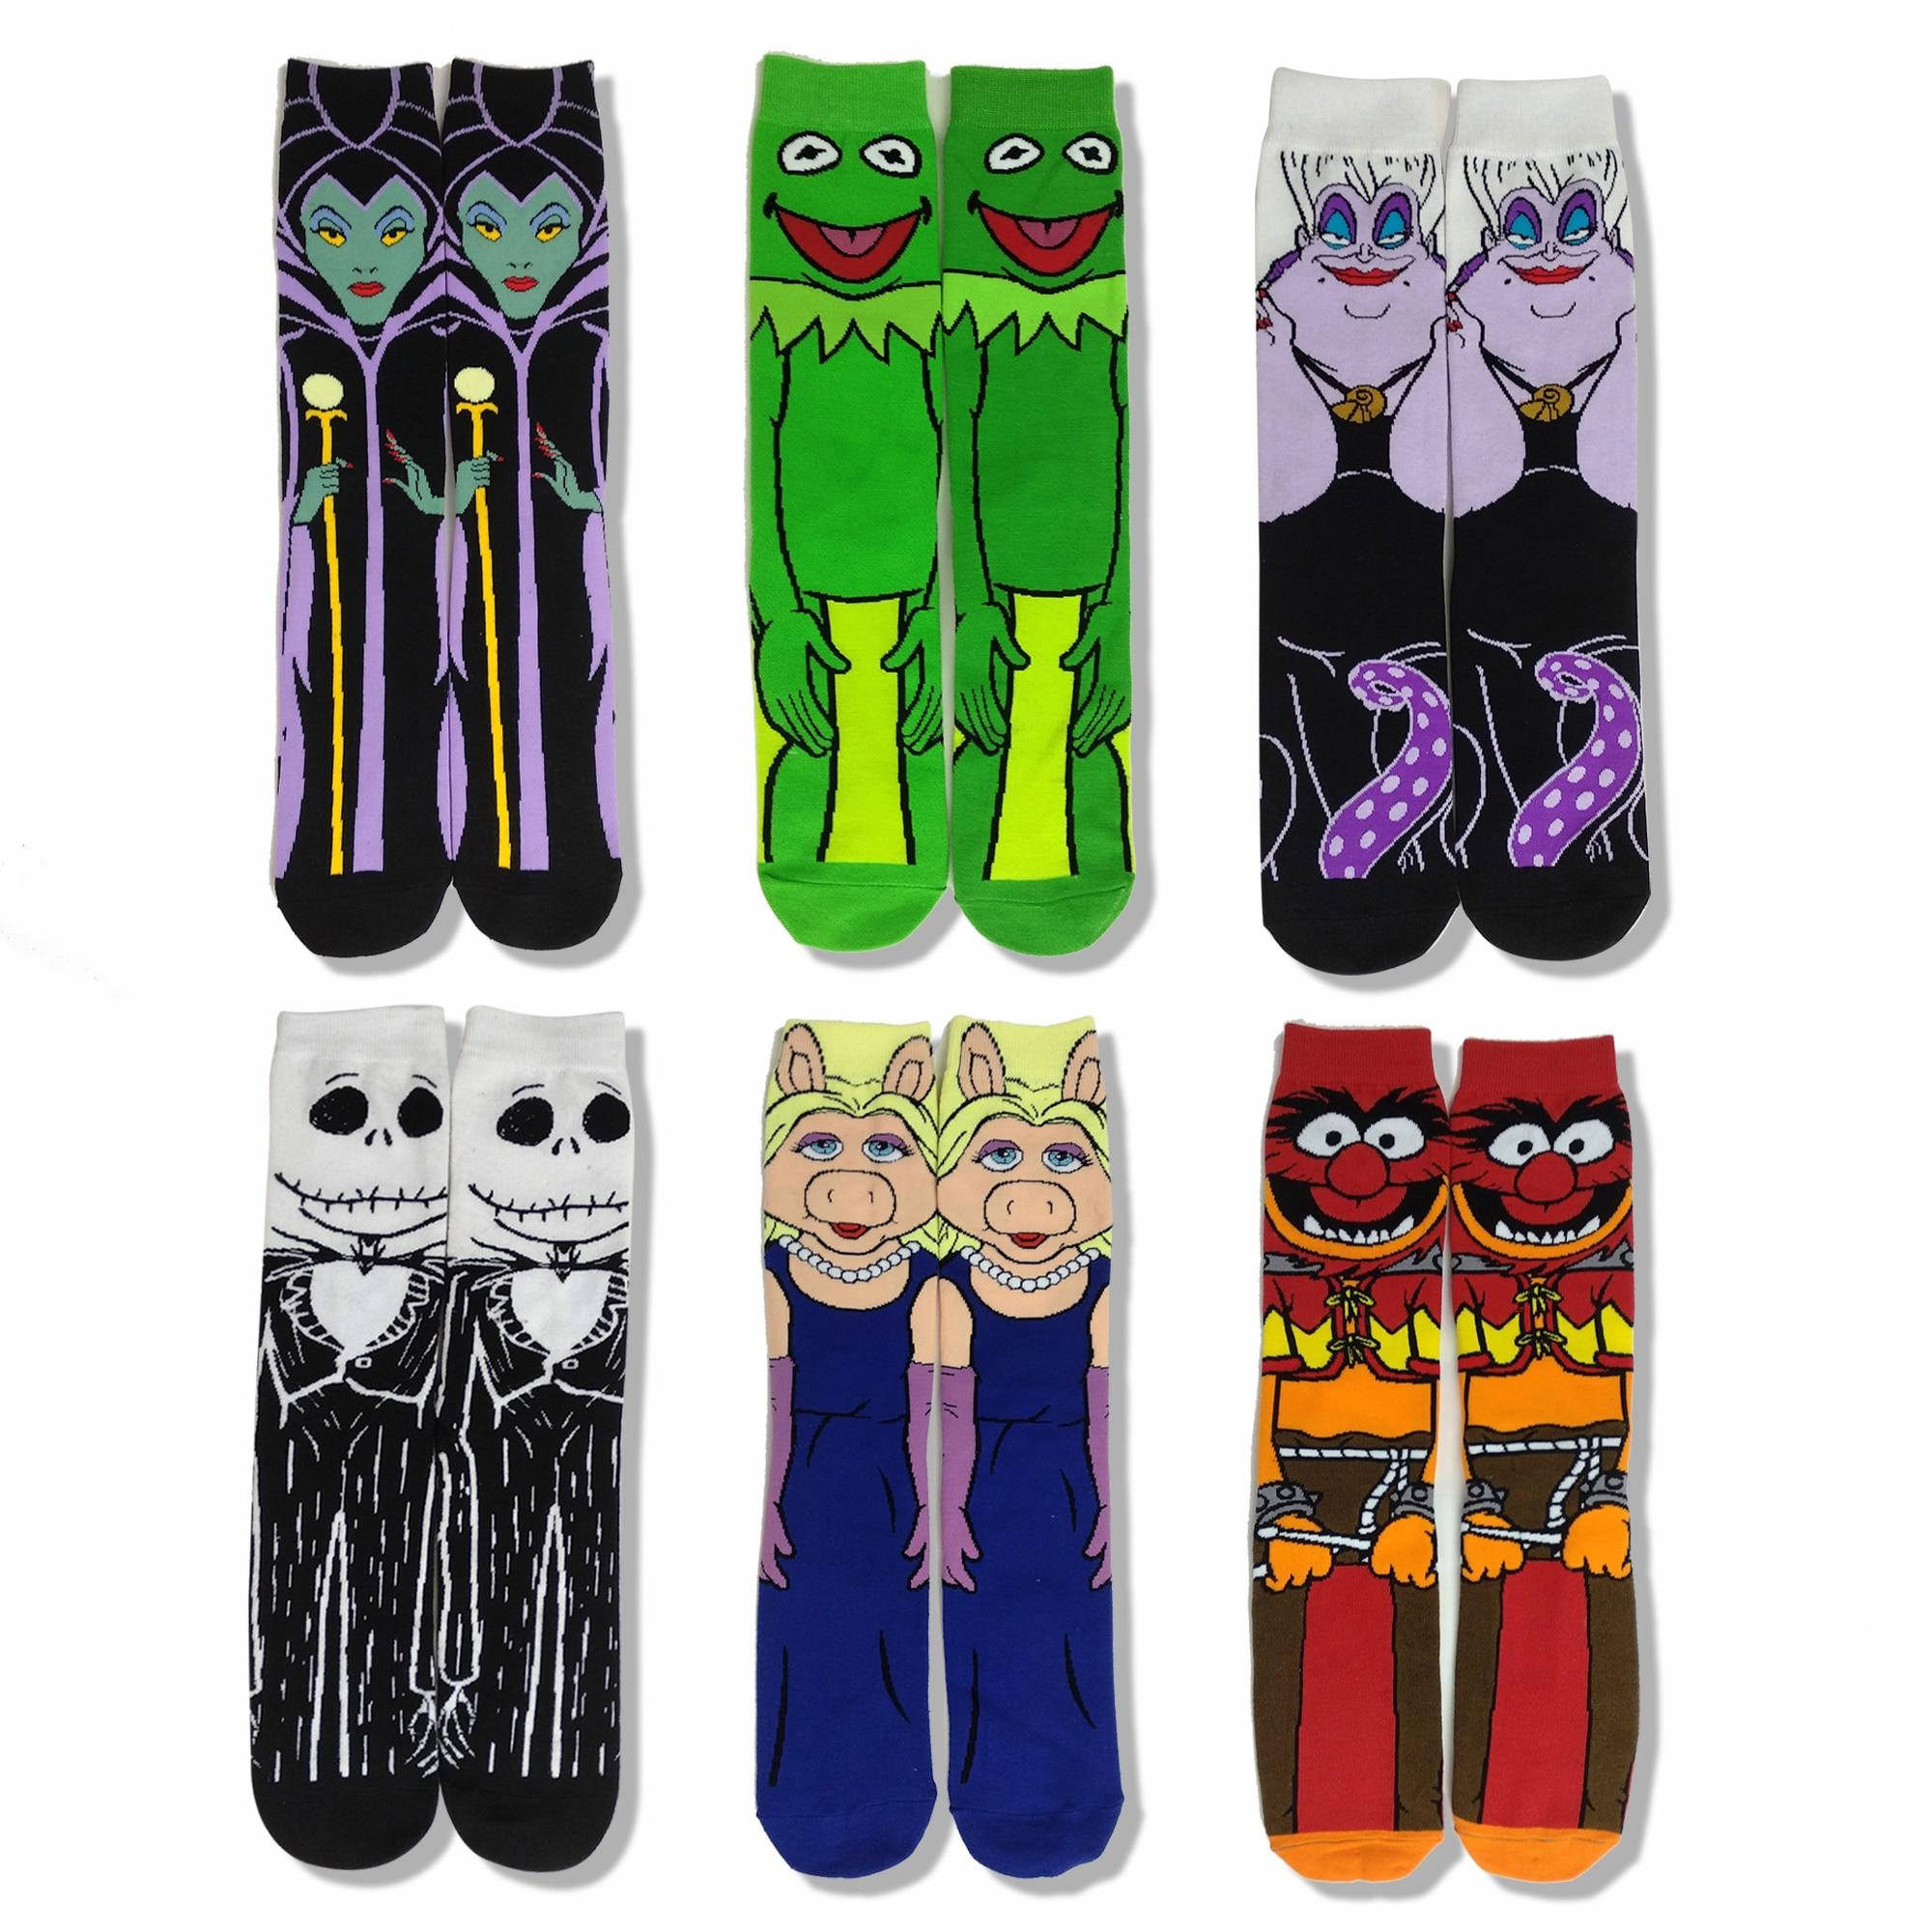 Cotton Anime Mens Socks Dress Casual Hip Hop Stance Socks Unisex Harajuku Creative Winter Warm Cartoon Character Socks